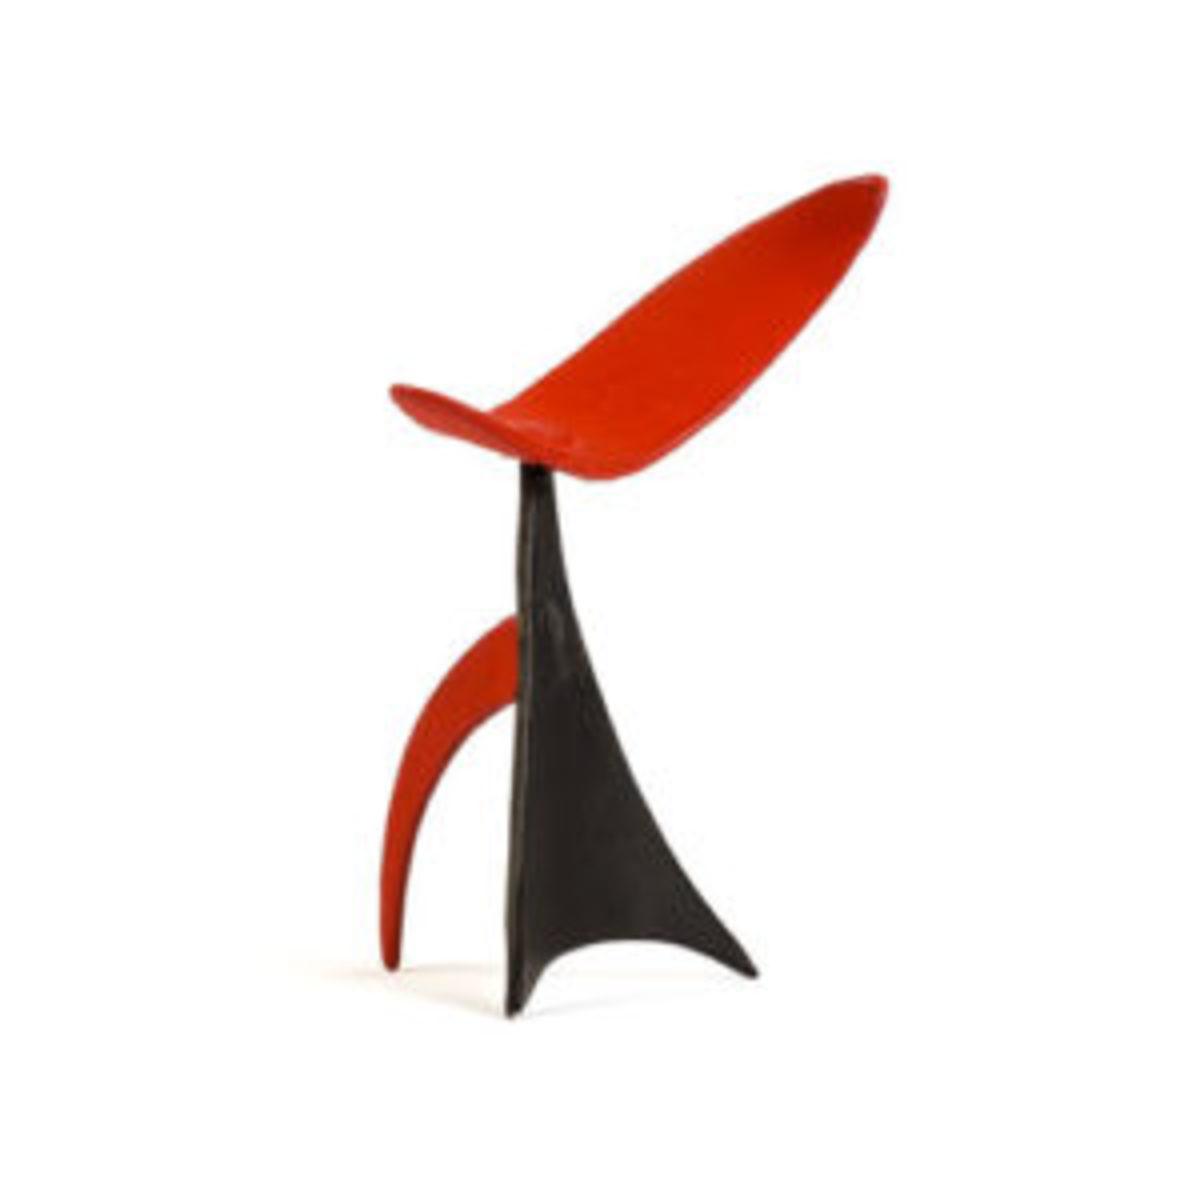 "Calder ""Crayfish"" stabiles"